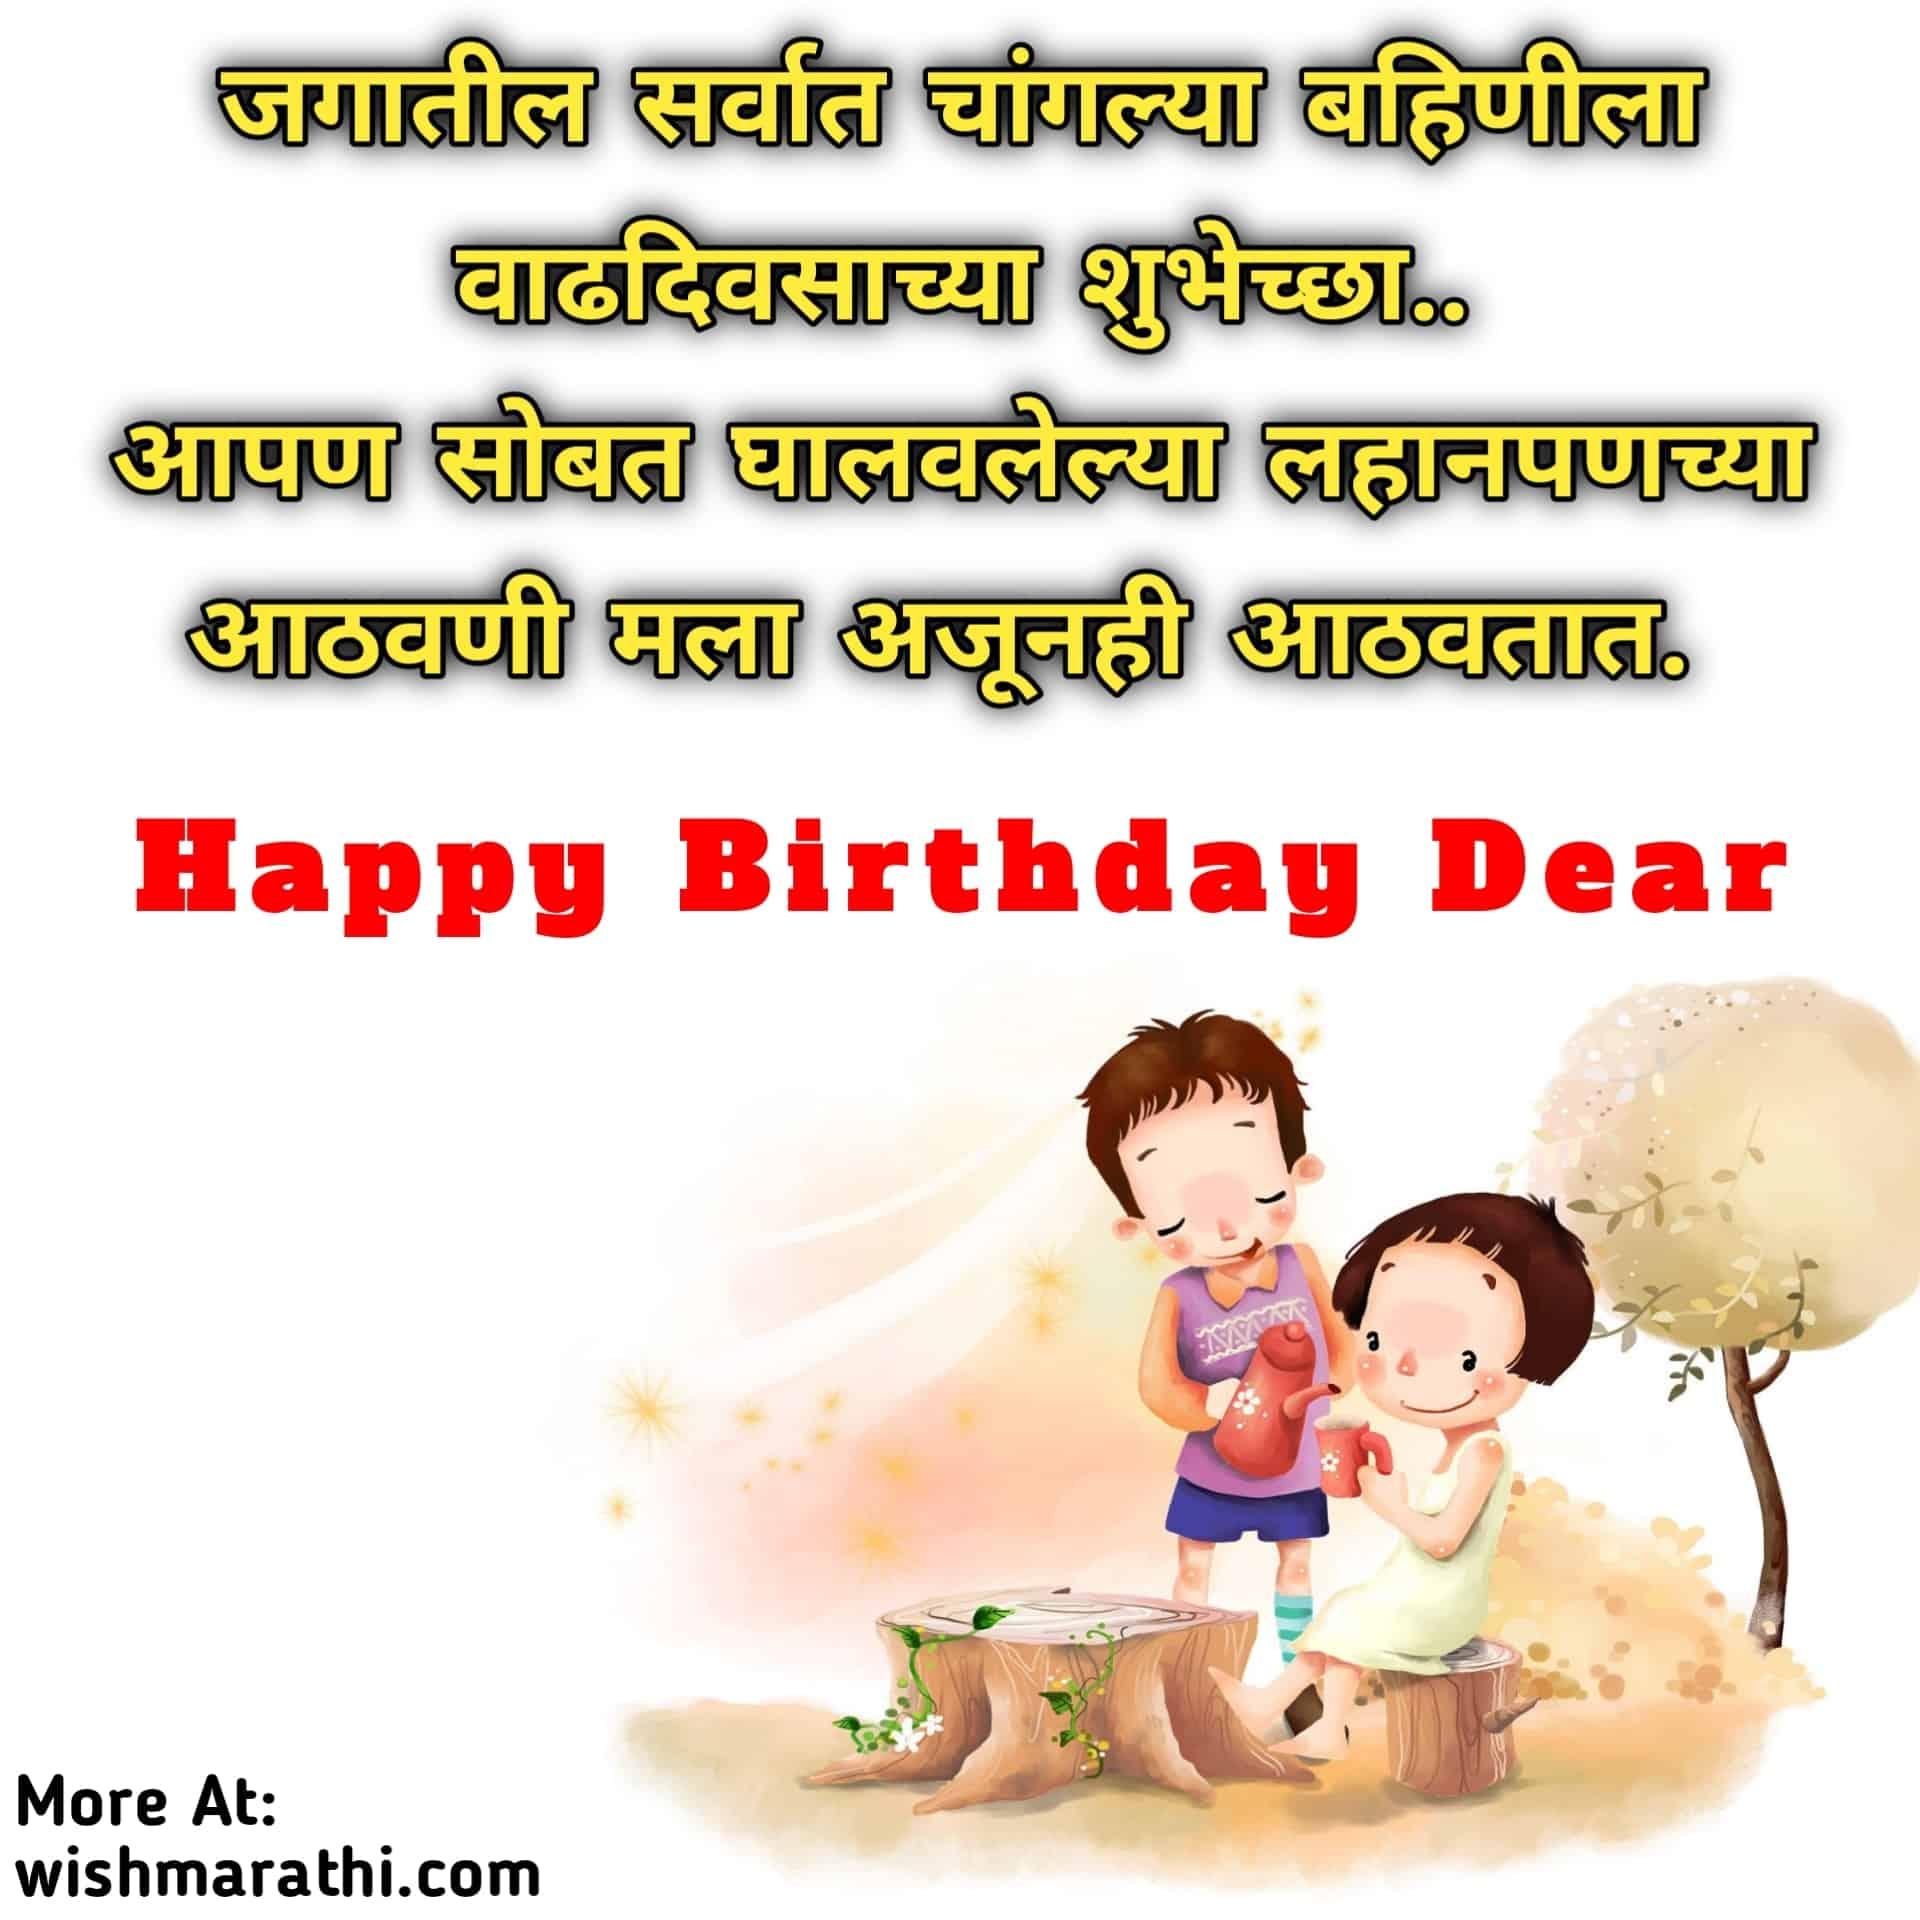 bday msg for sister in marathi